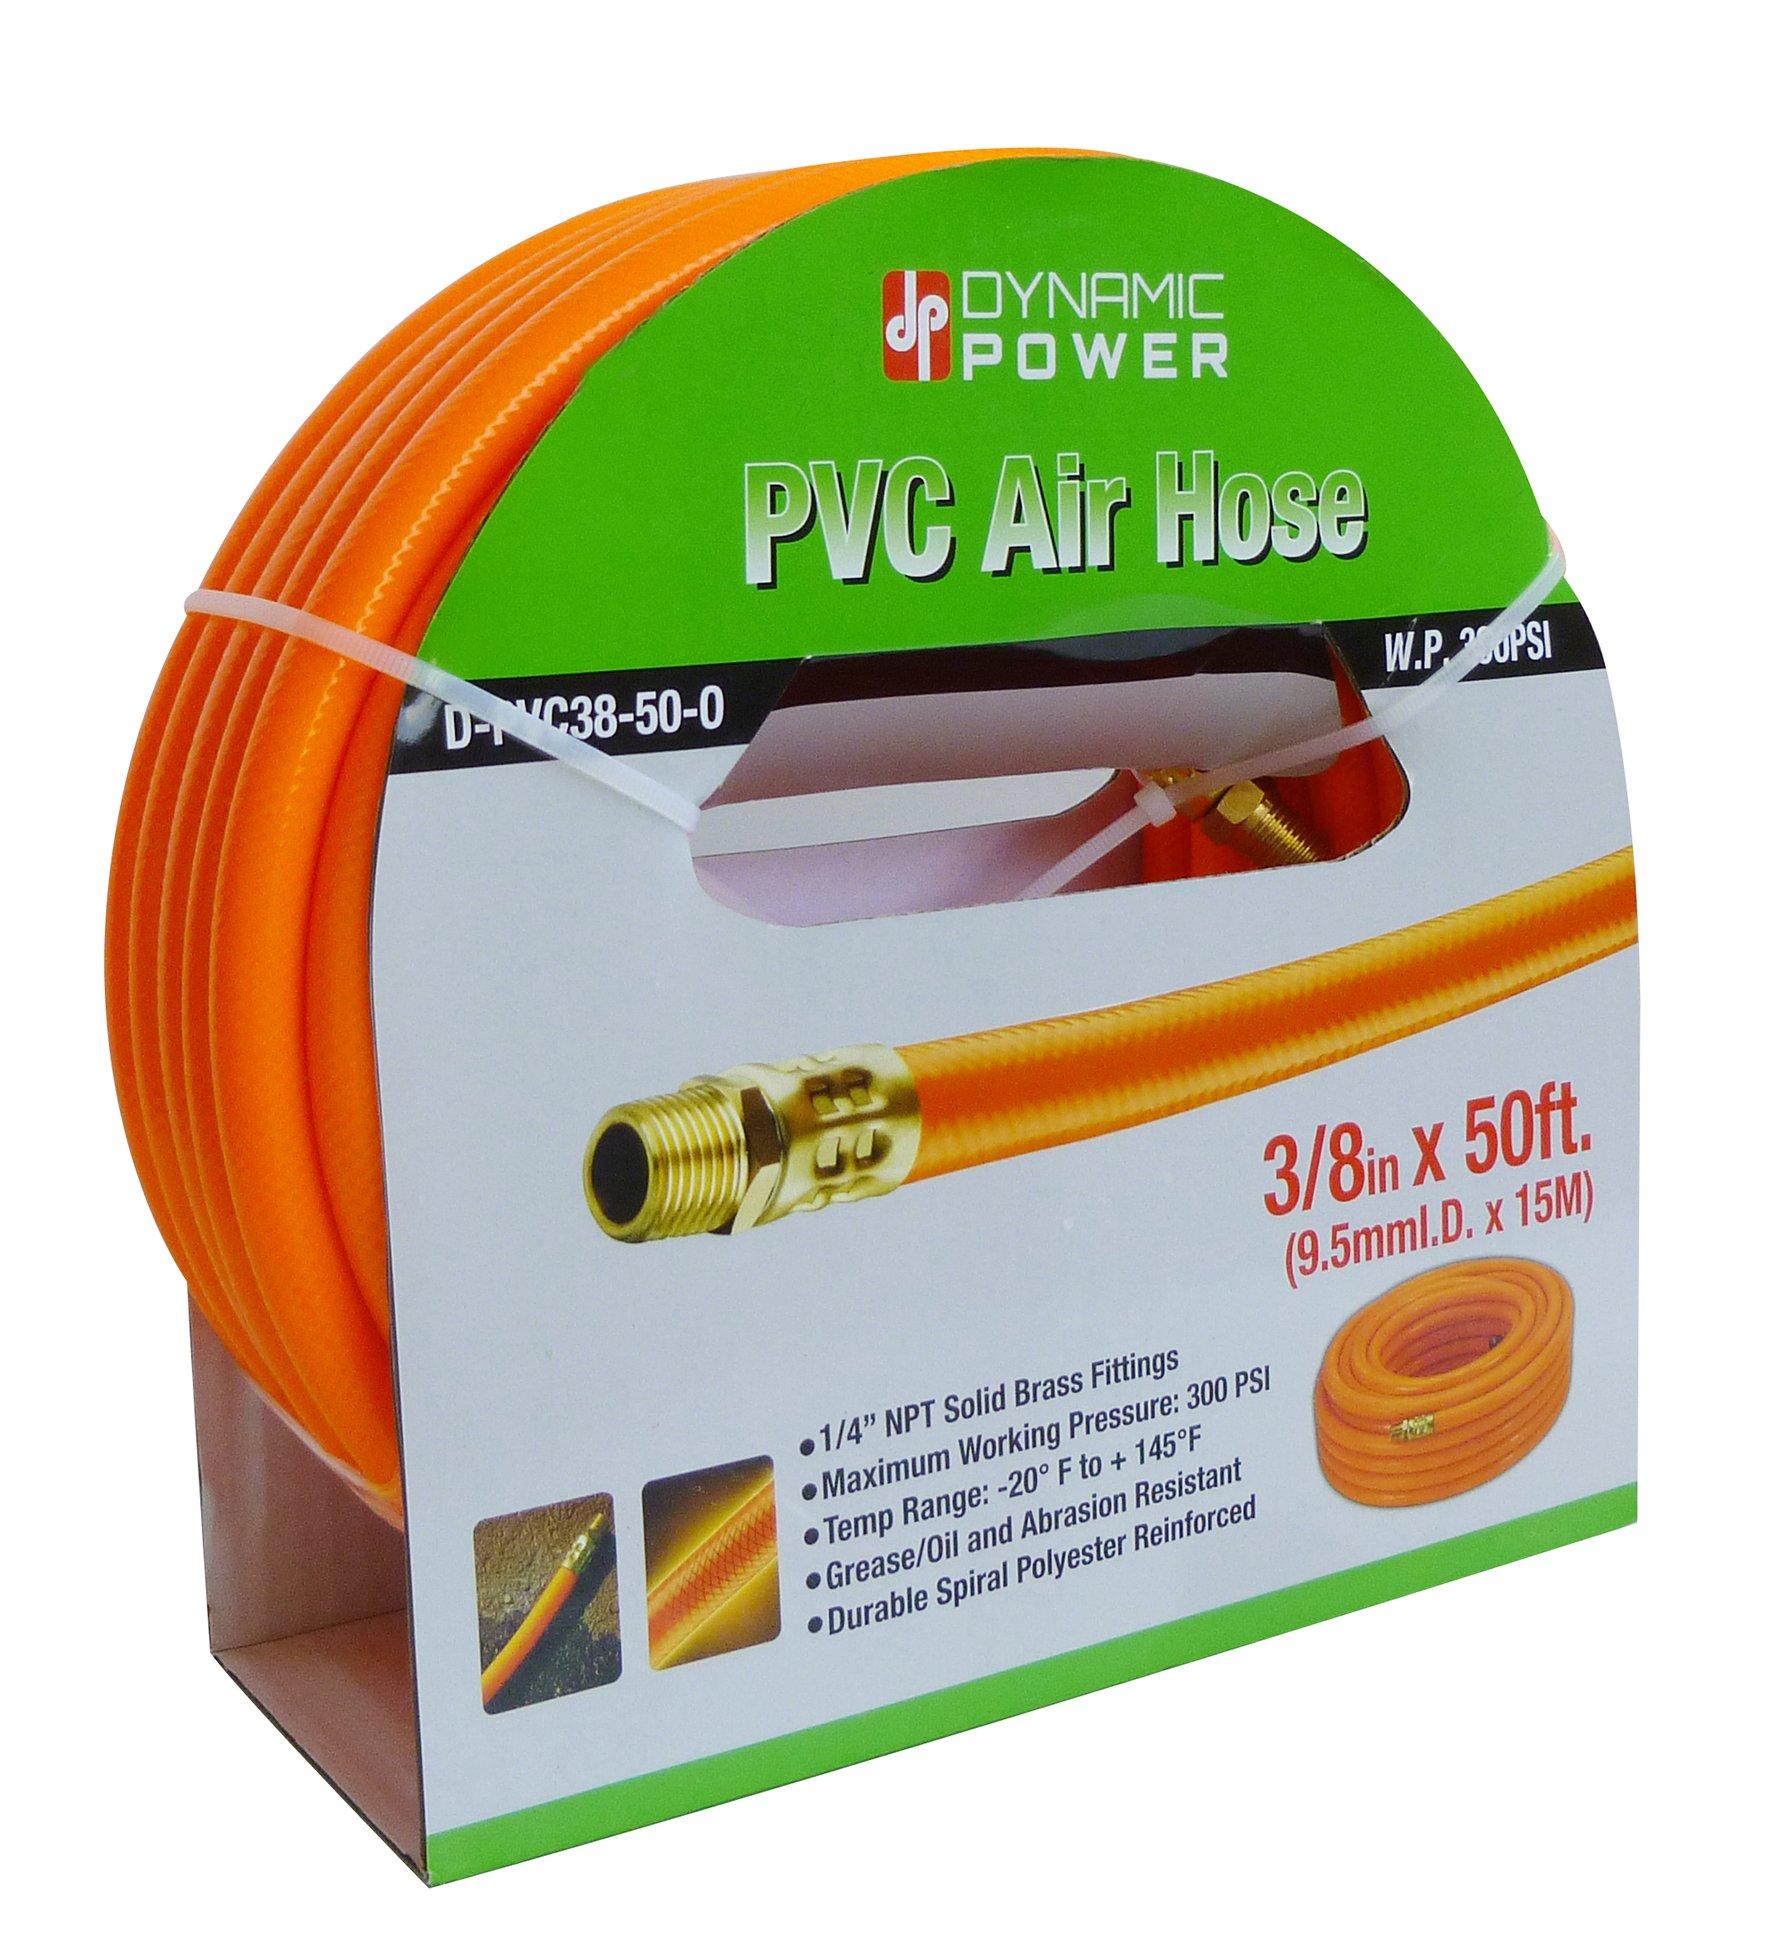 Dynamic Power PVC Air Hose Heavy-Duty Air Hose, 50ft, 3/8-Inch, Reinforced PVC Hose with Brass Fittings (Orange)